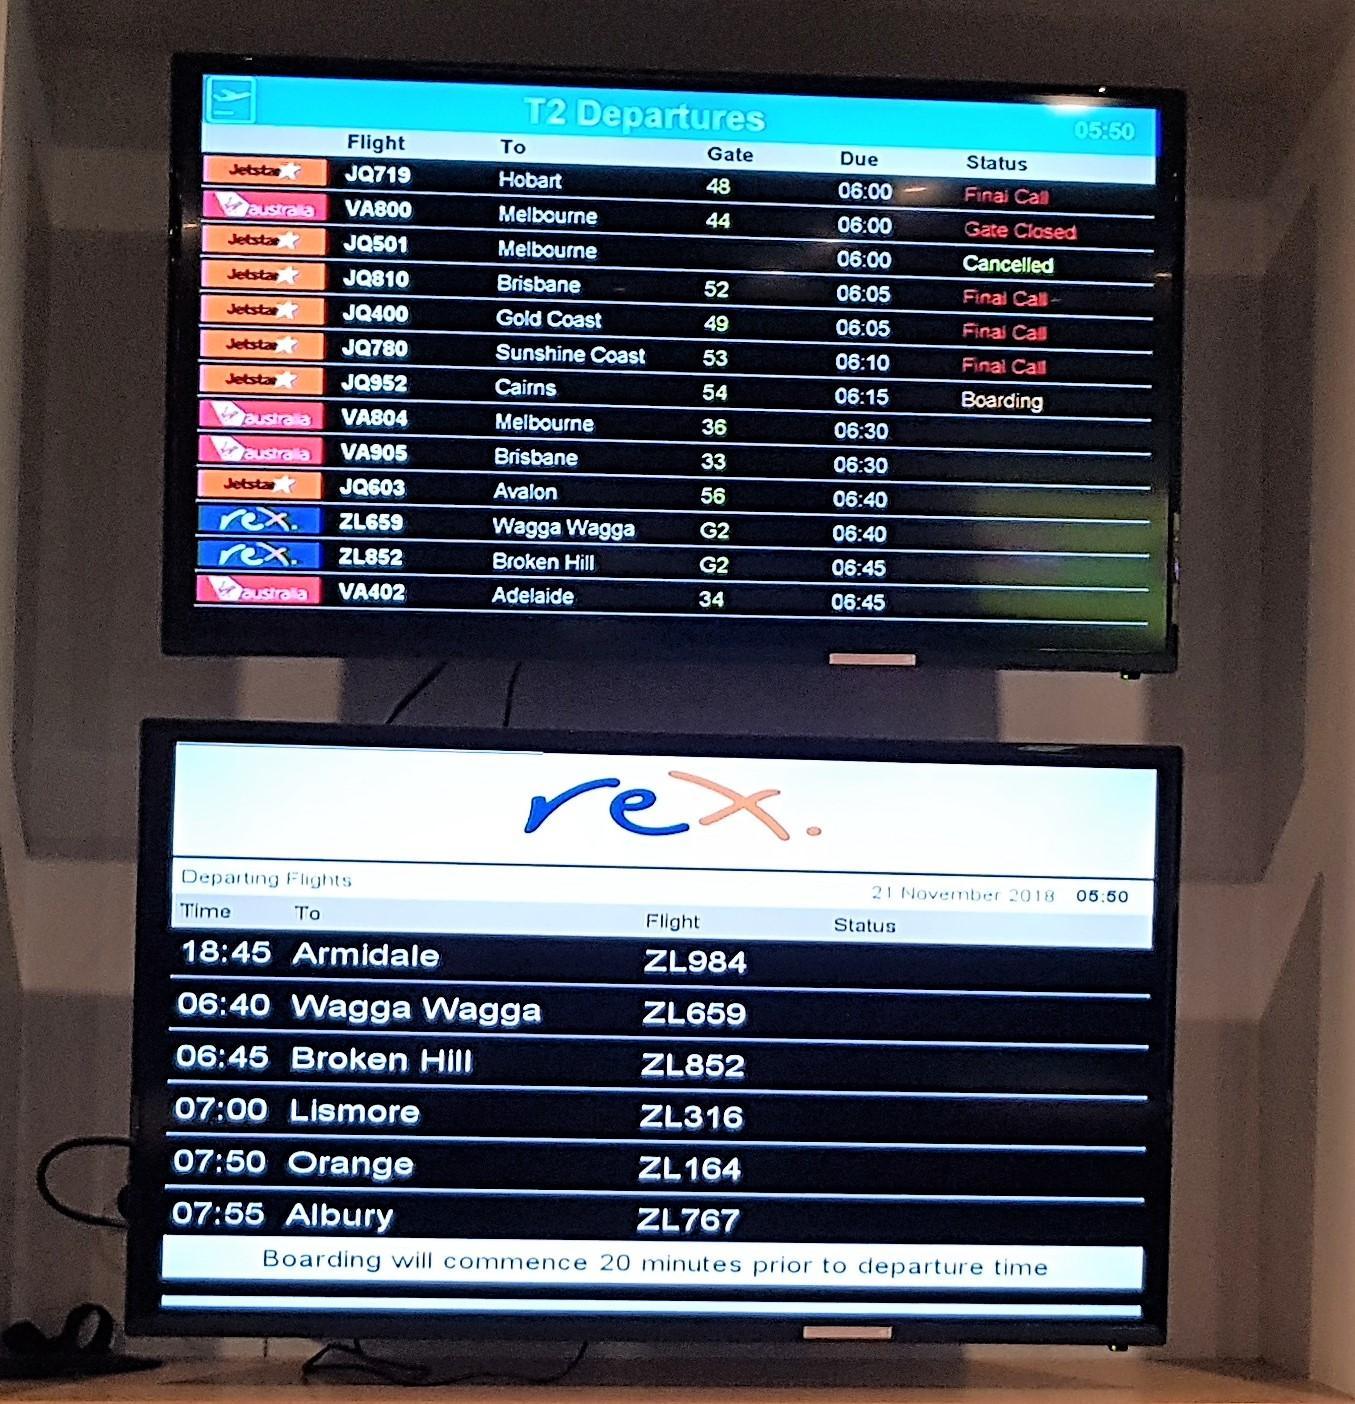 REX Lounge Sydney departure list screen